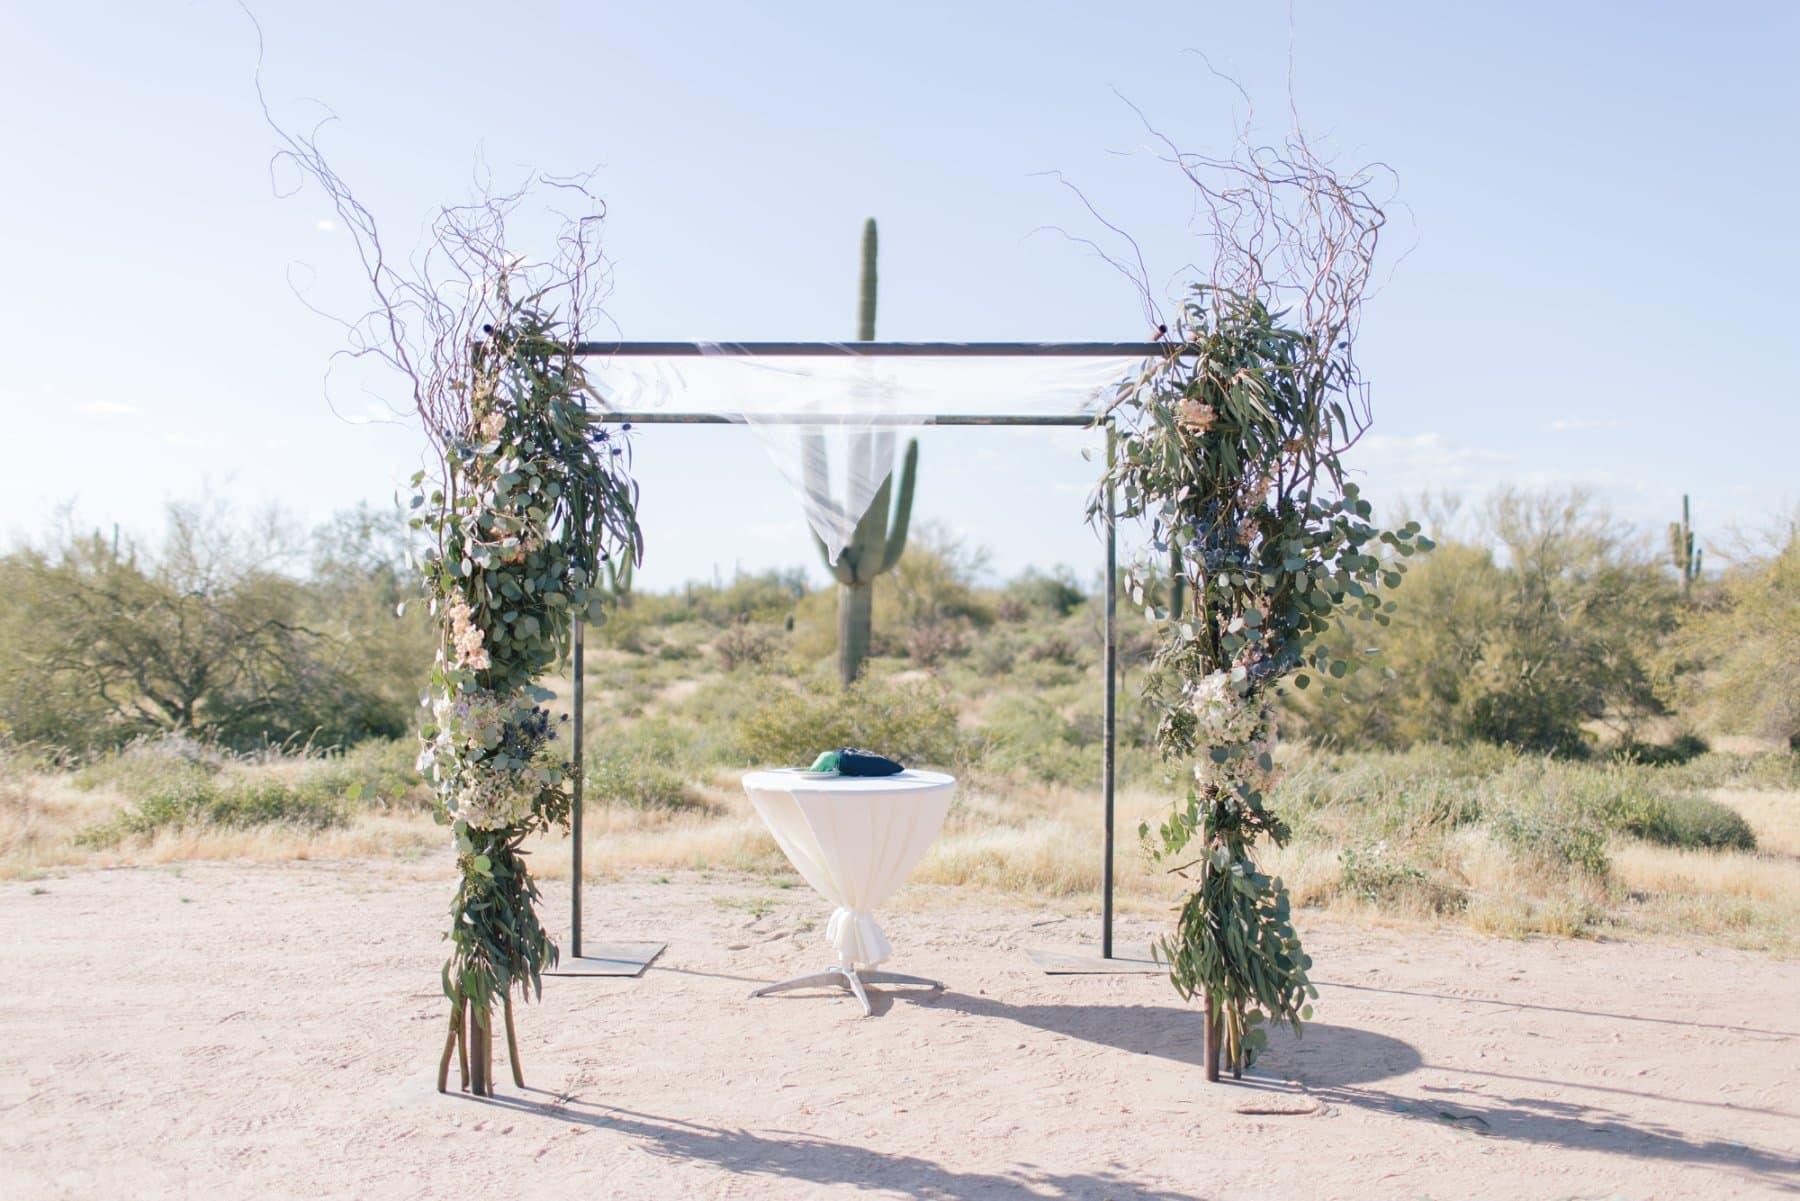 Desert Foothills Barn wedding outdoor desert wedding ceremony chuppah